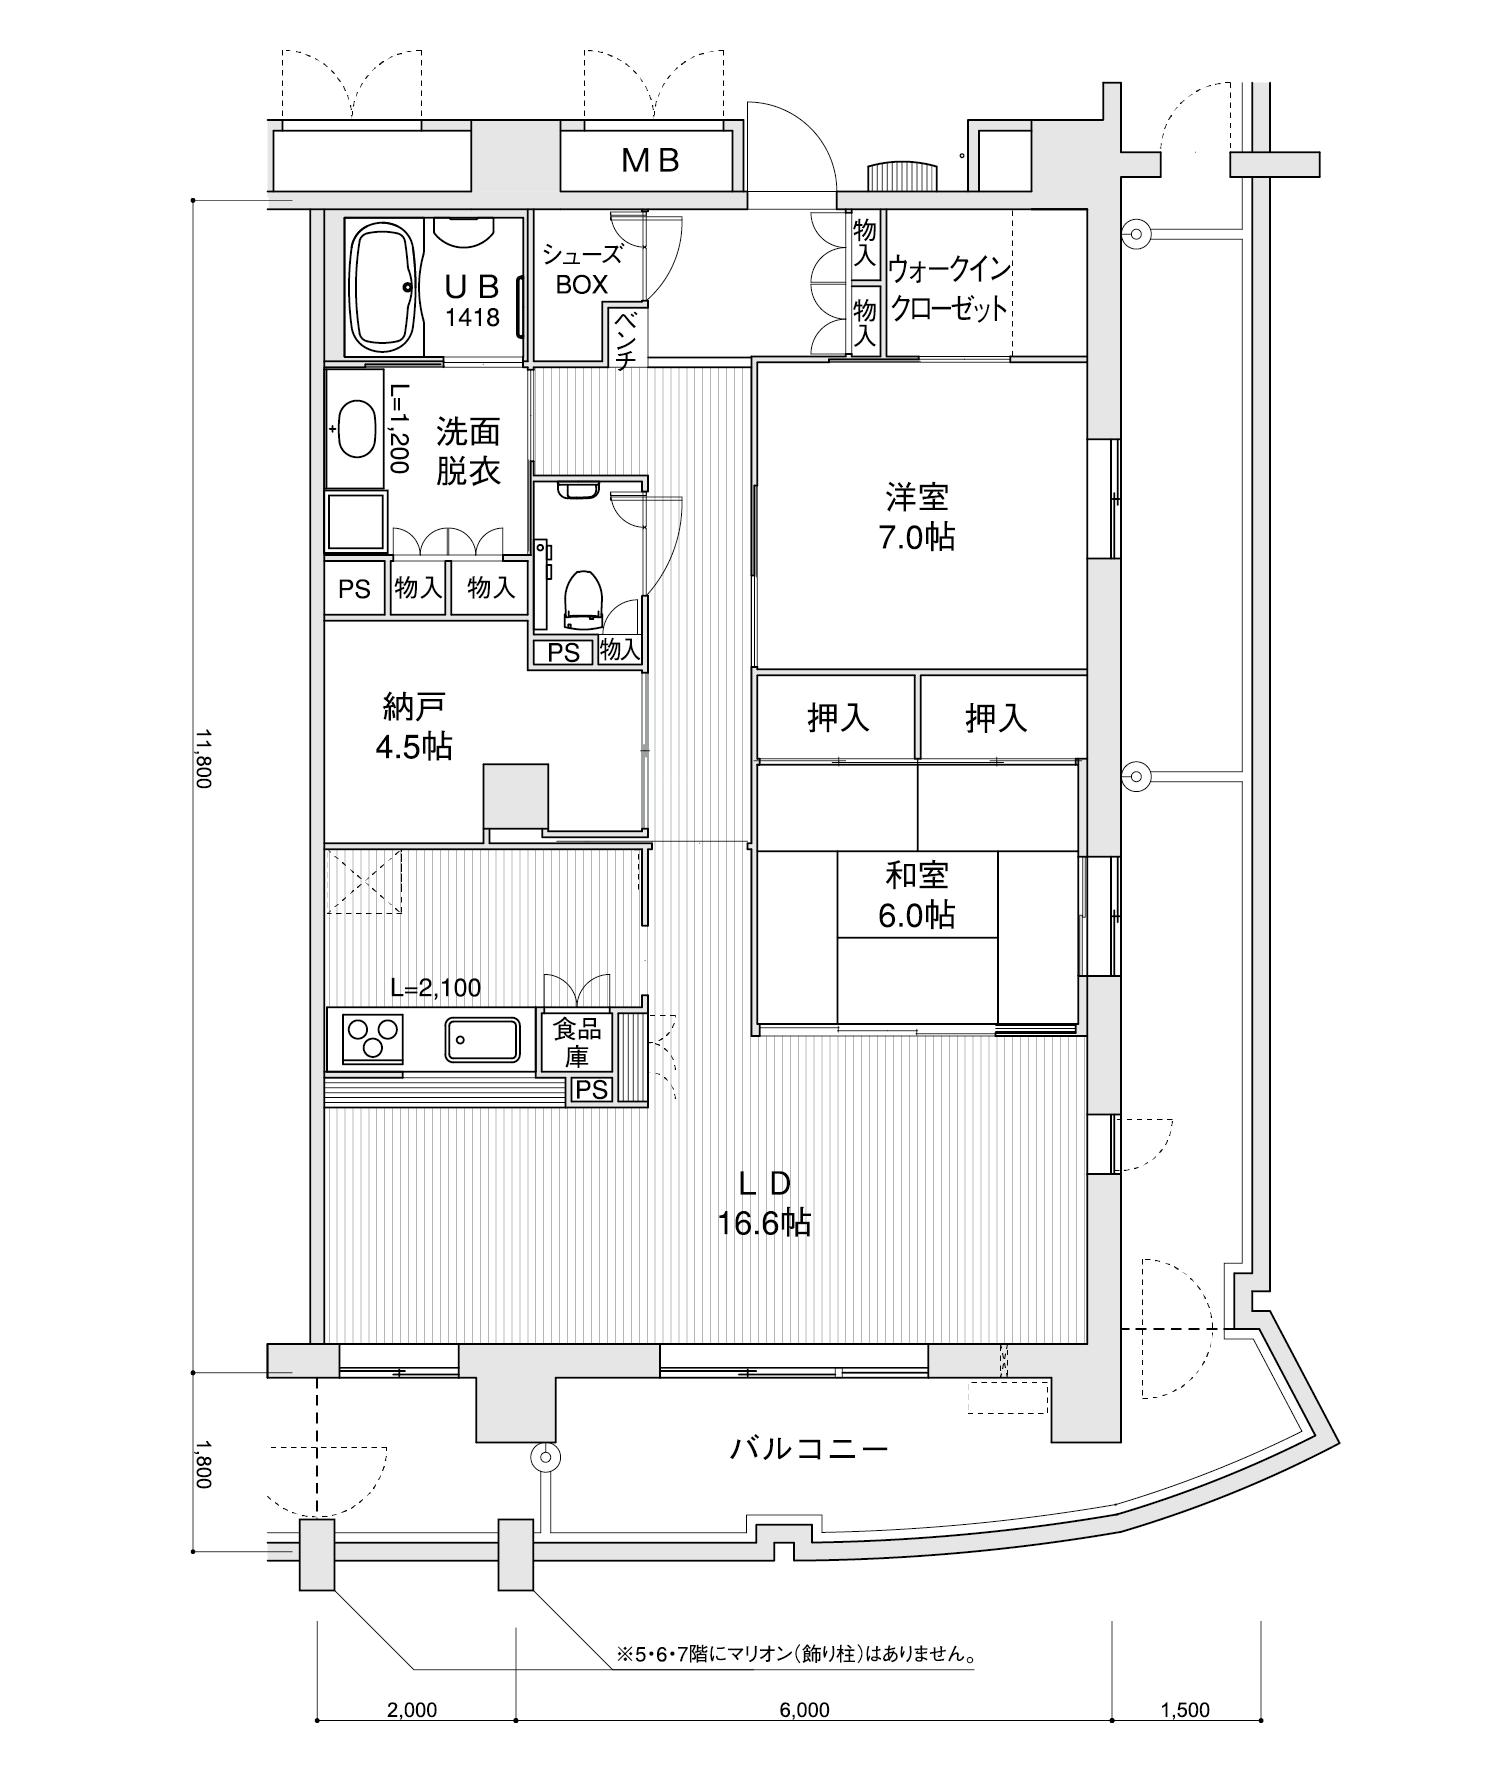 2207-K12LDK+納戸専有面積 / 94.40m²